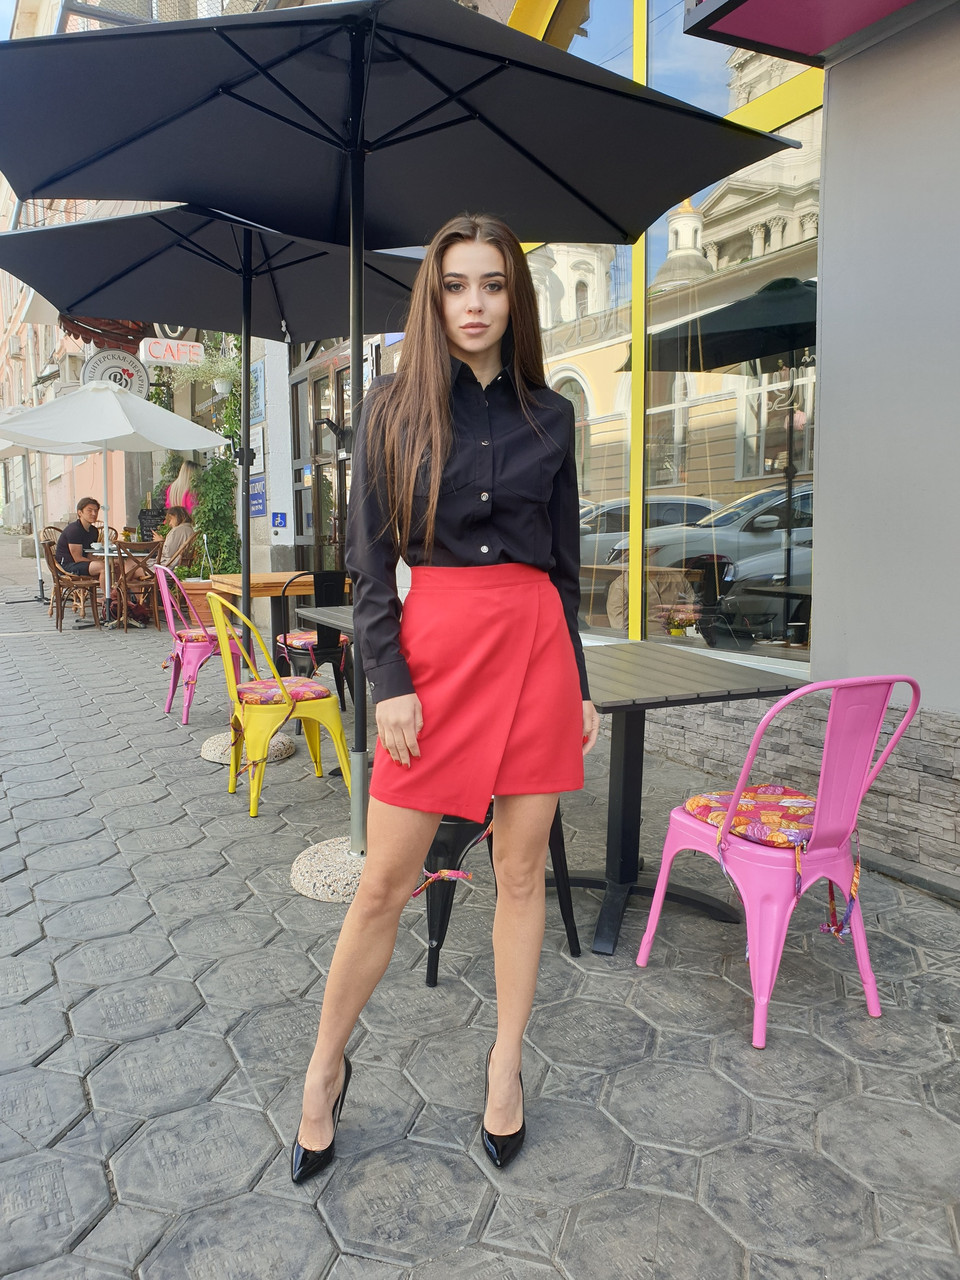 Женская асимметричная юбка выше колена с имитацией запаха, р. 42, 44, 46 4511425